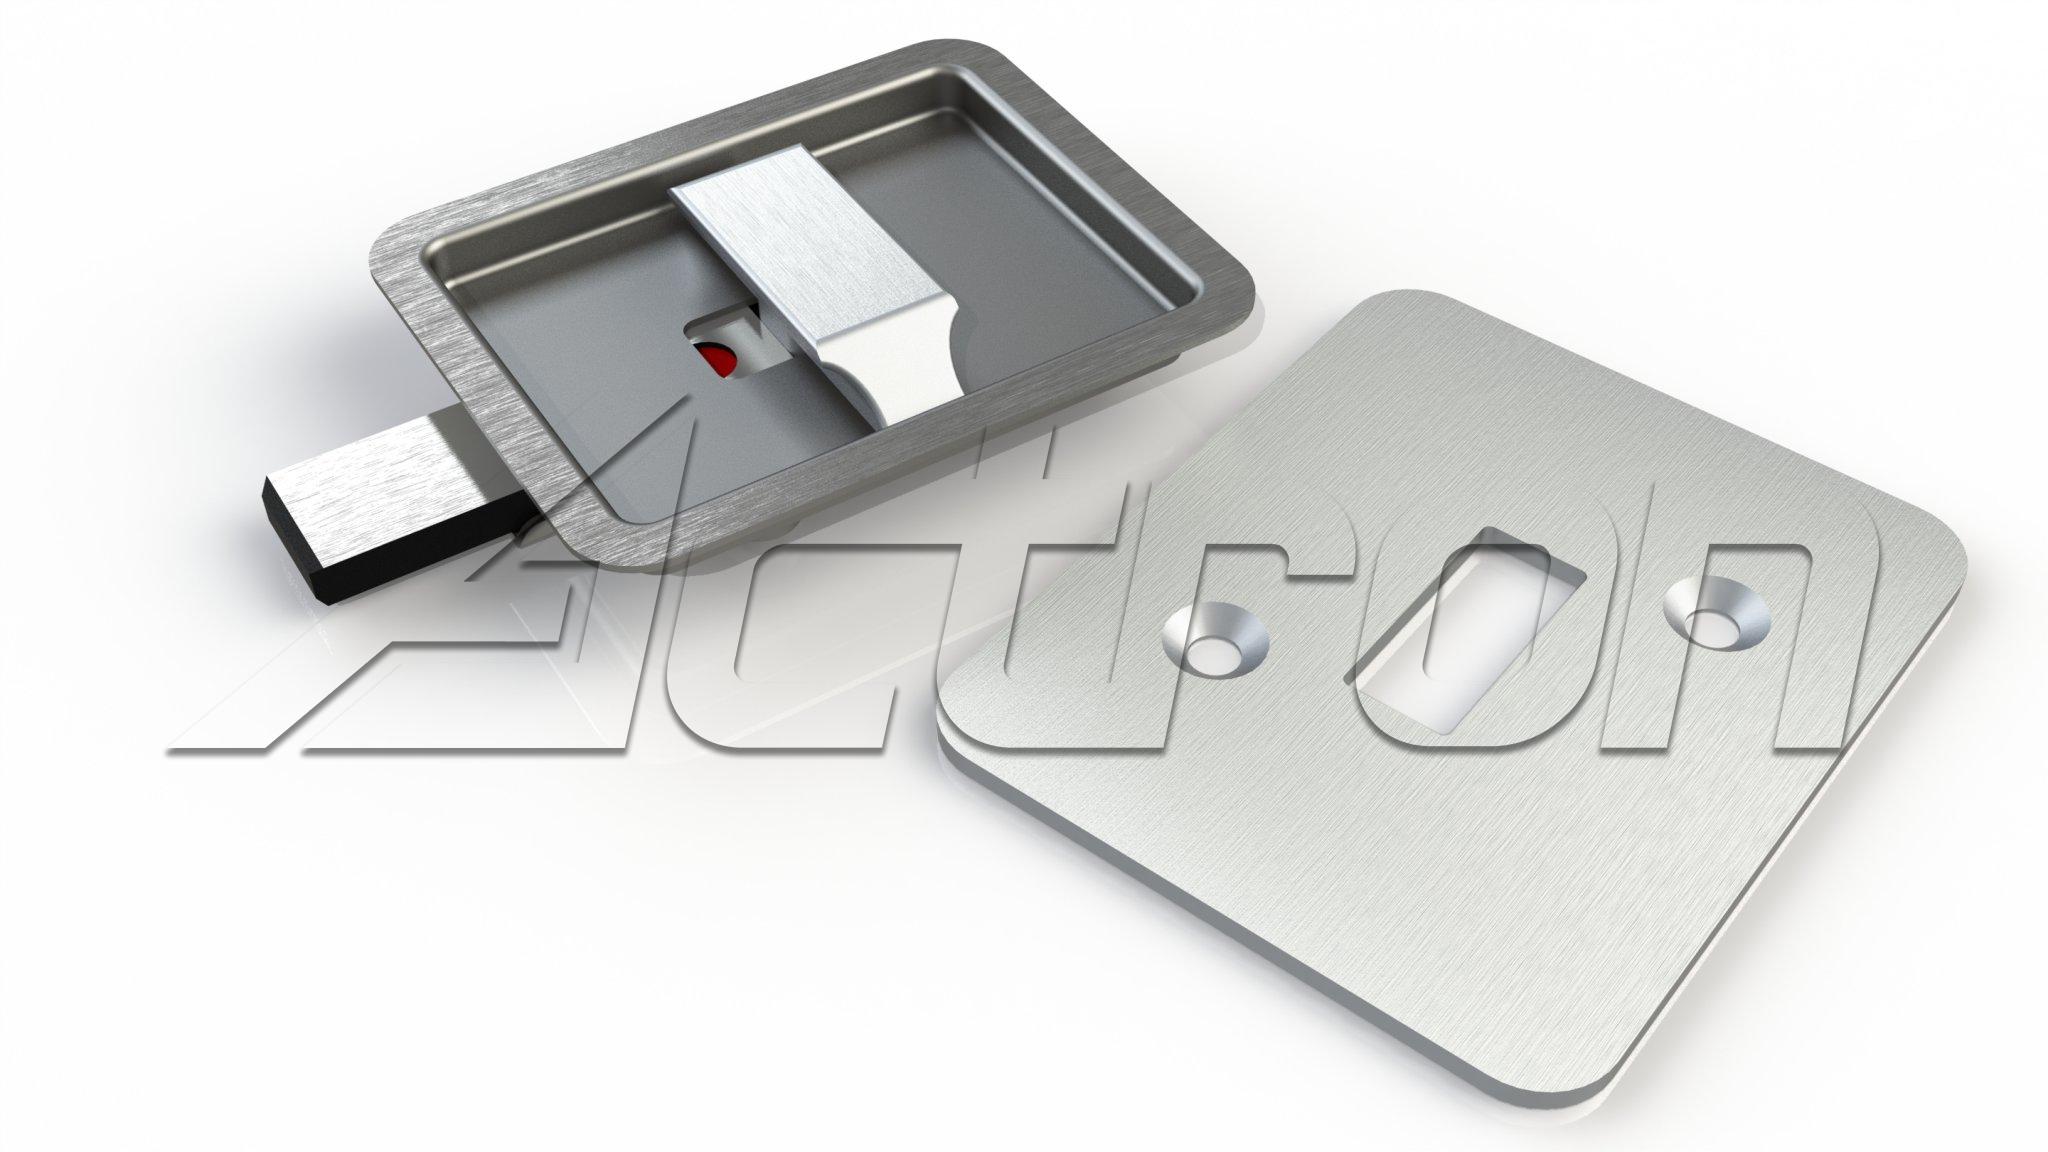 latch-assy-8211-sliding-4548-a27071.jpg